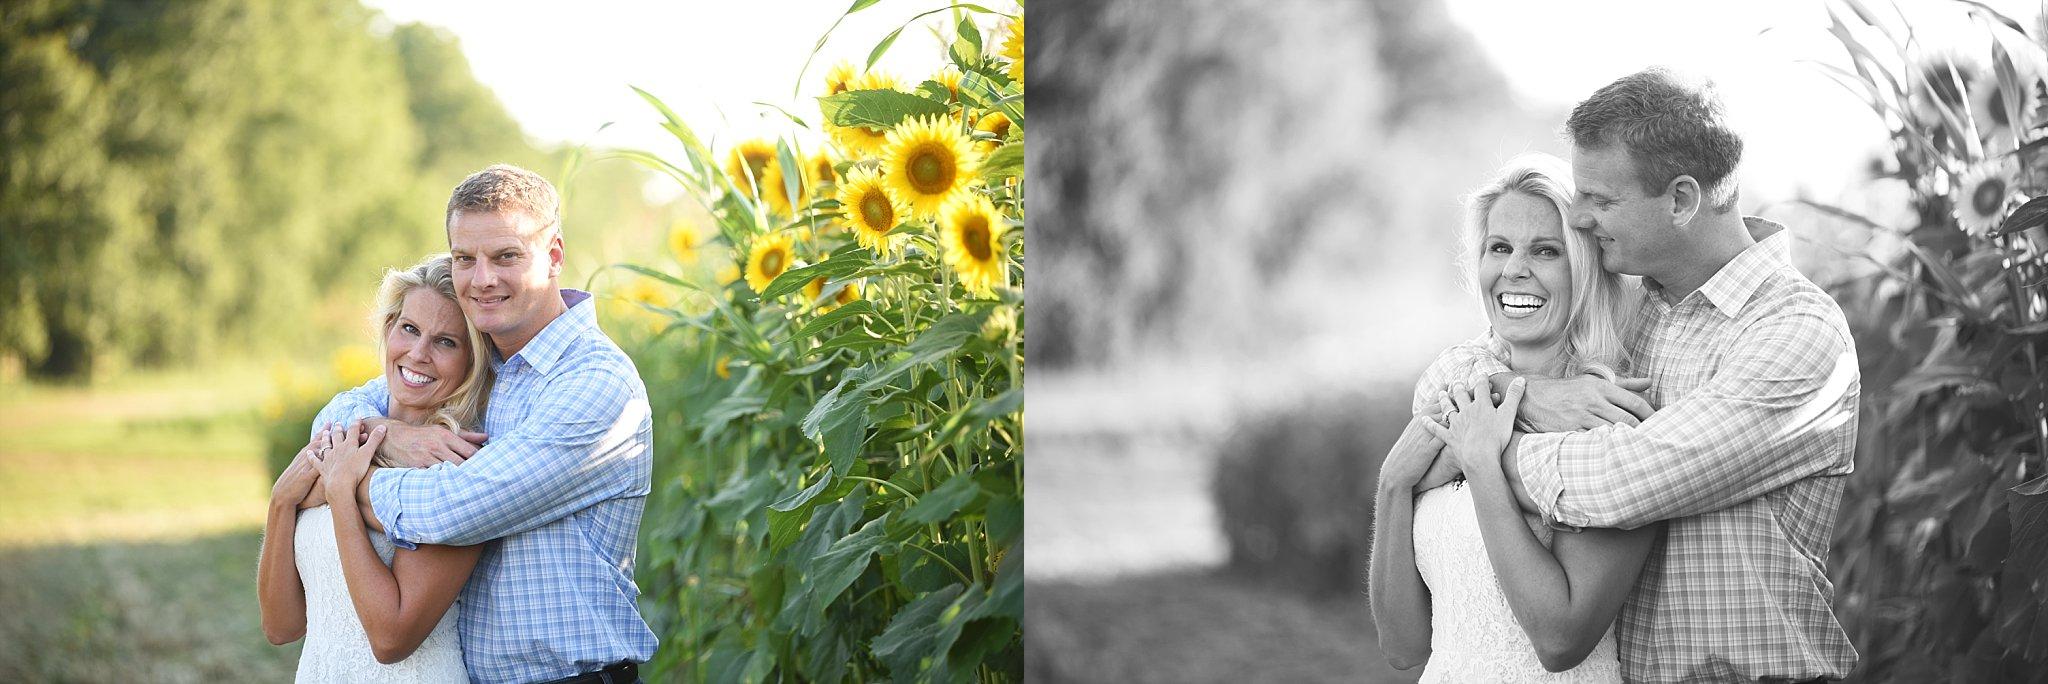 Sunflower-field-Photography-jenfolio_0130.jpg